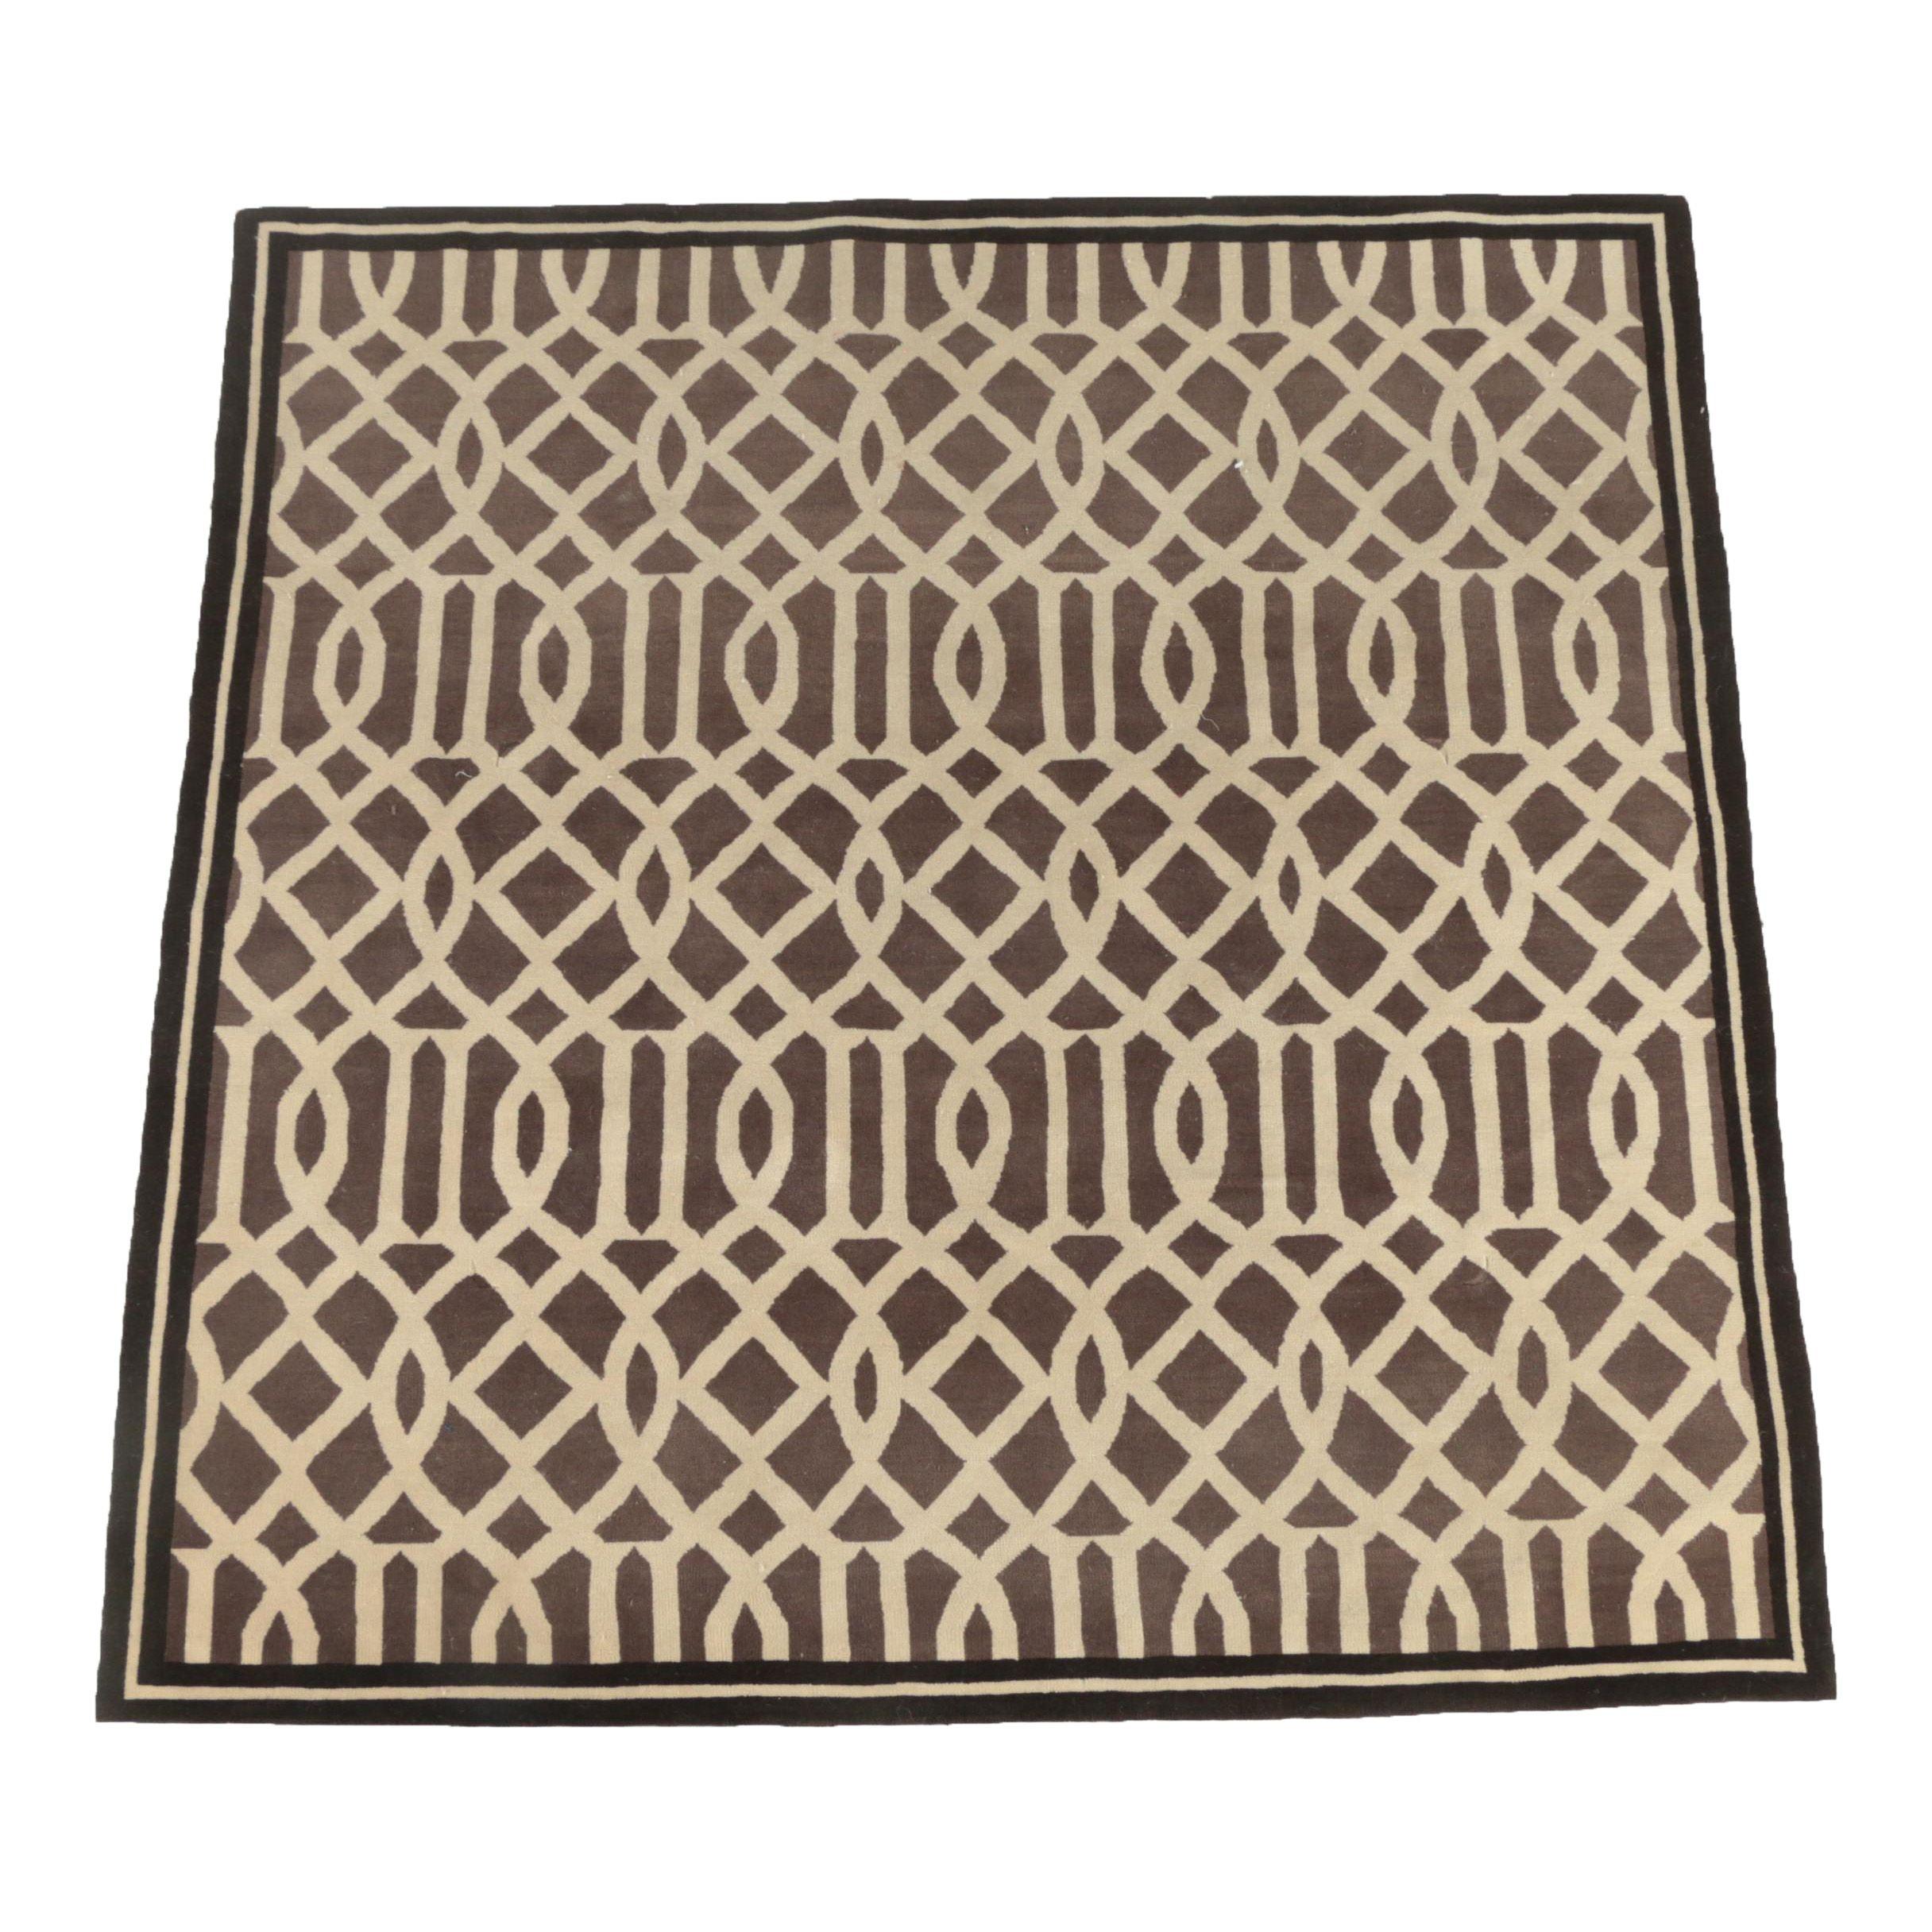 Handwoven Geometric Lattice Wool Area Rug